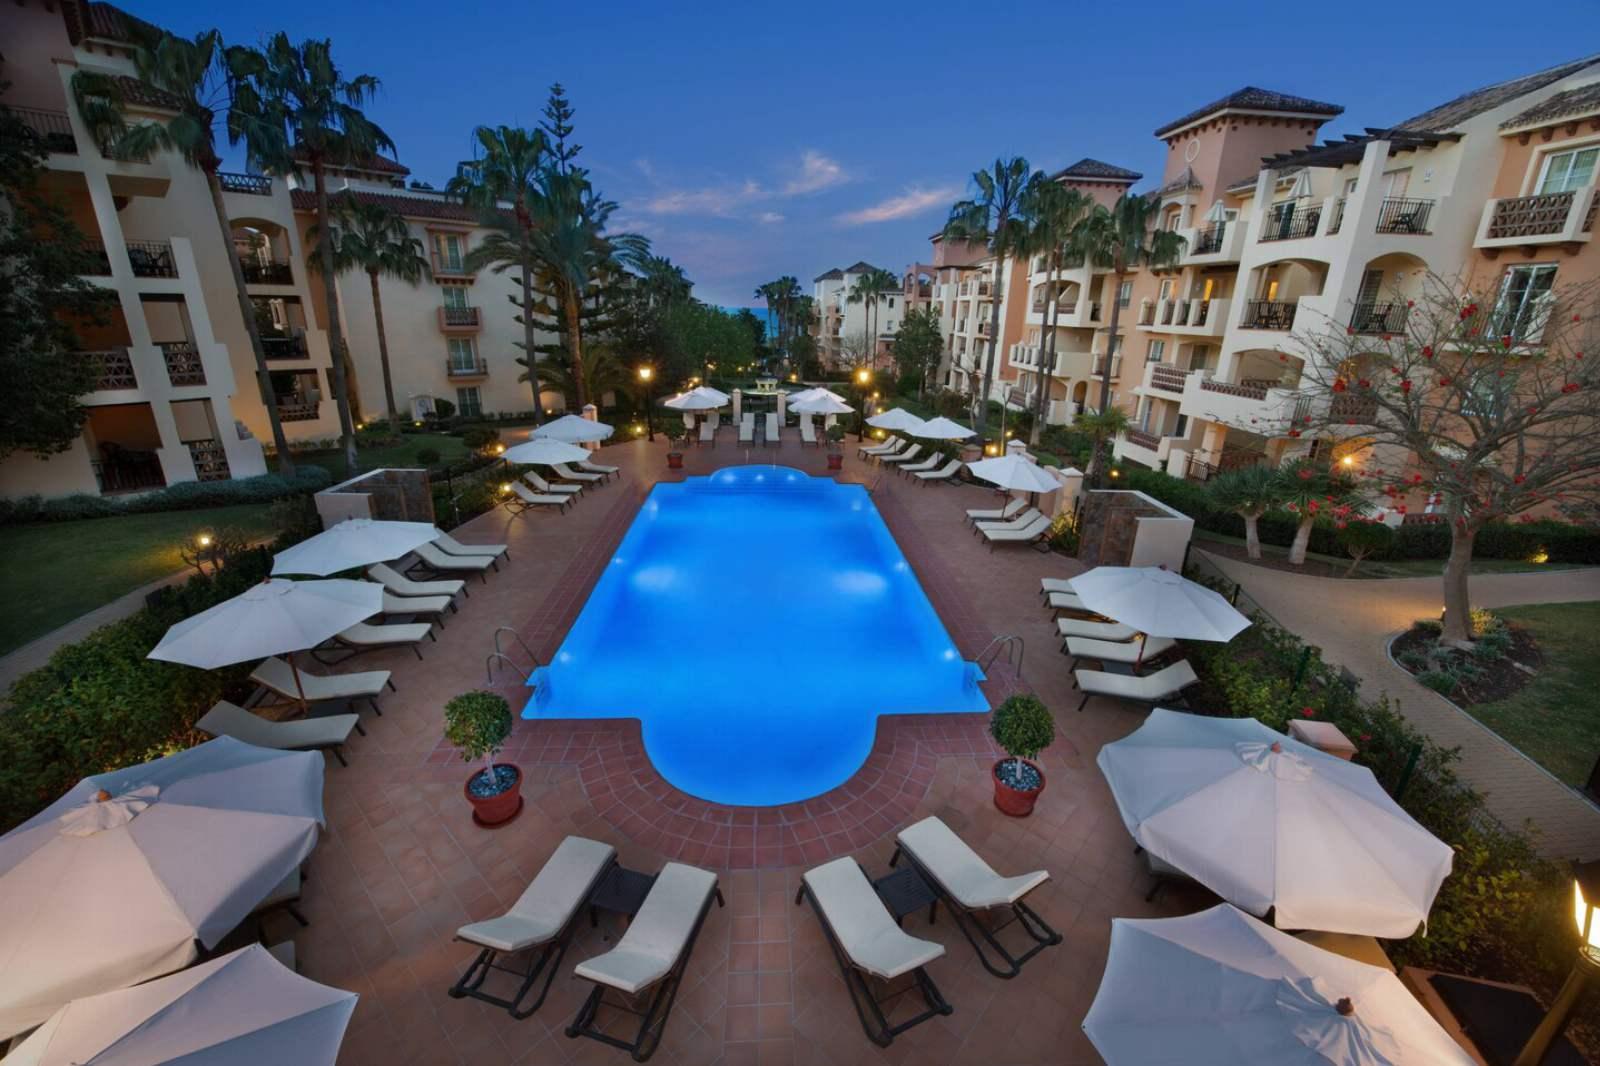 Marriott's Marbella Beach Resort - Garden Lap Pool